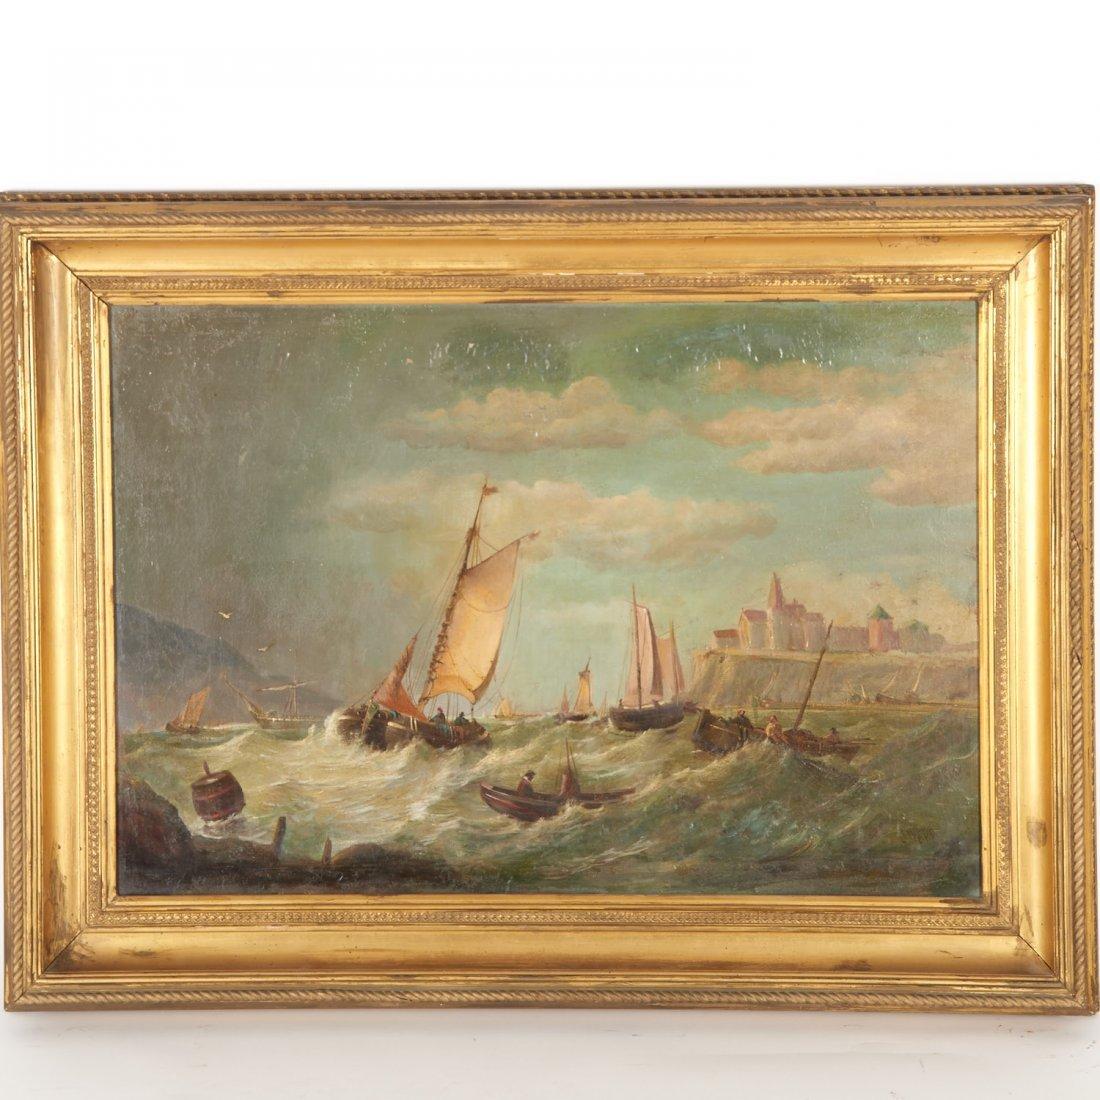 James Webb, large oil painting